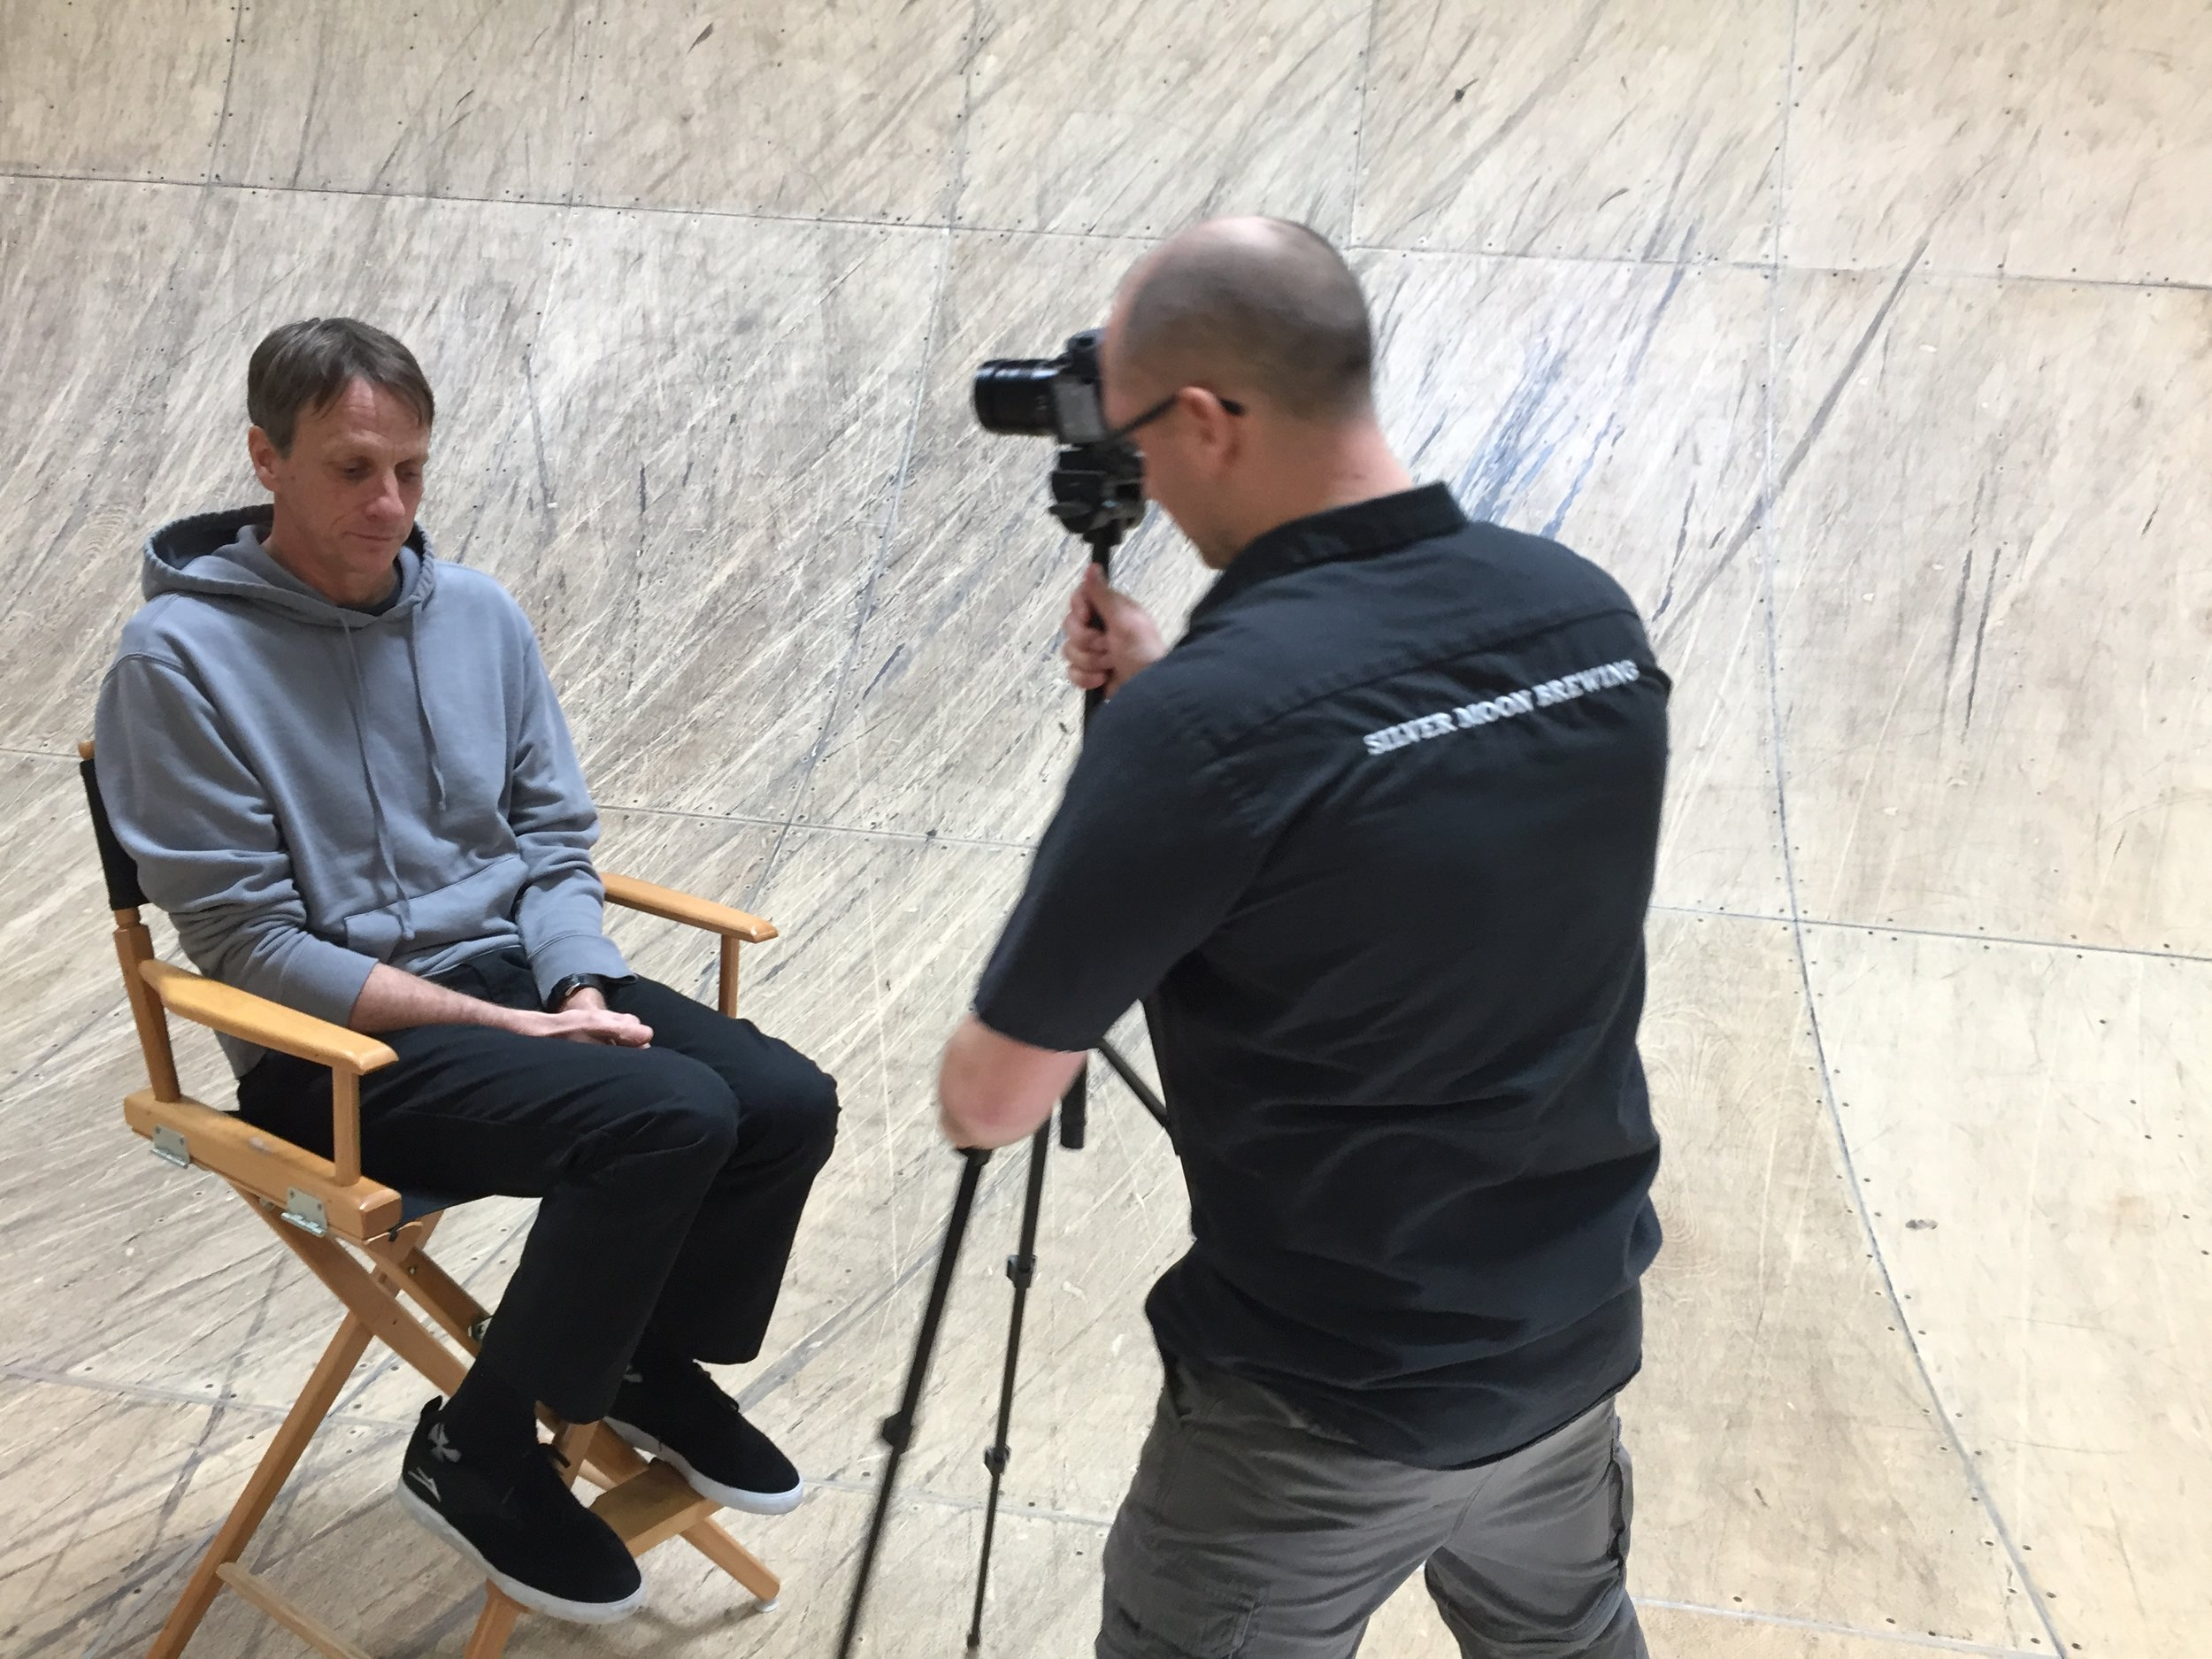 Tony Hawk's interview for 7 Hills.